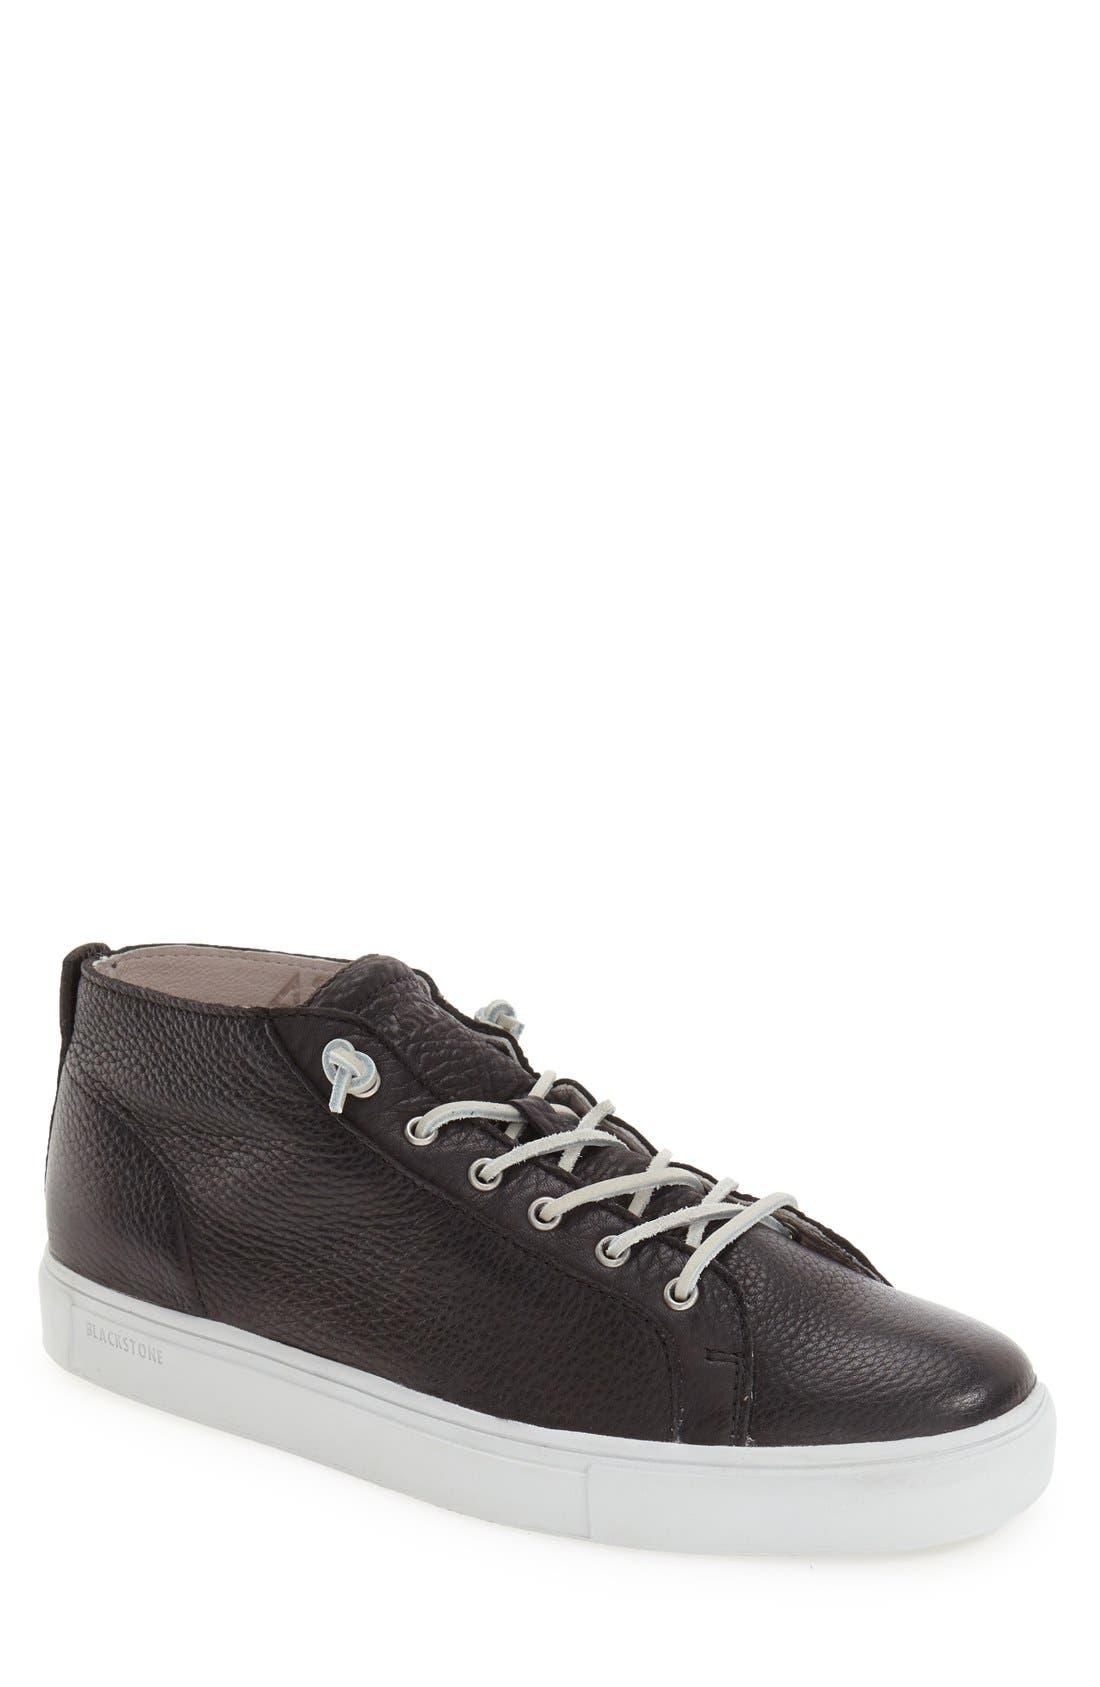 Blackstone 'LM11' Sneaker (Men)